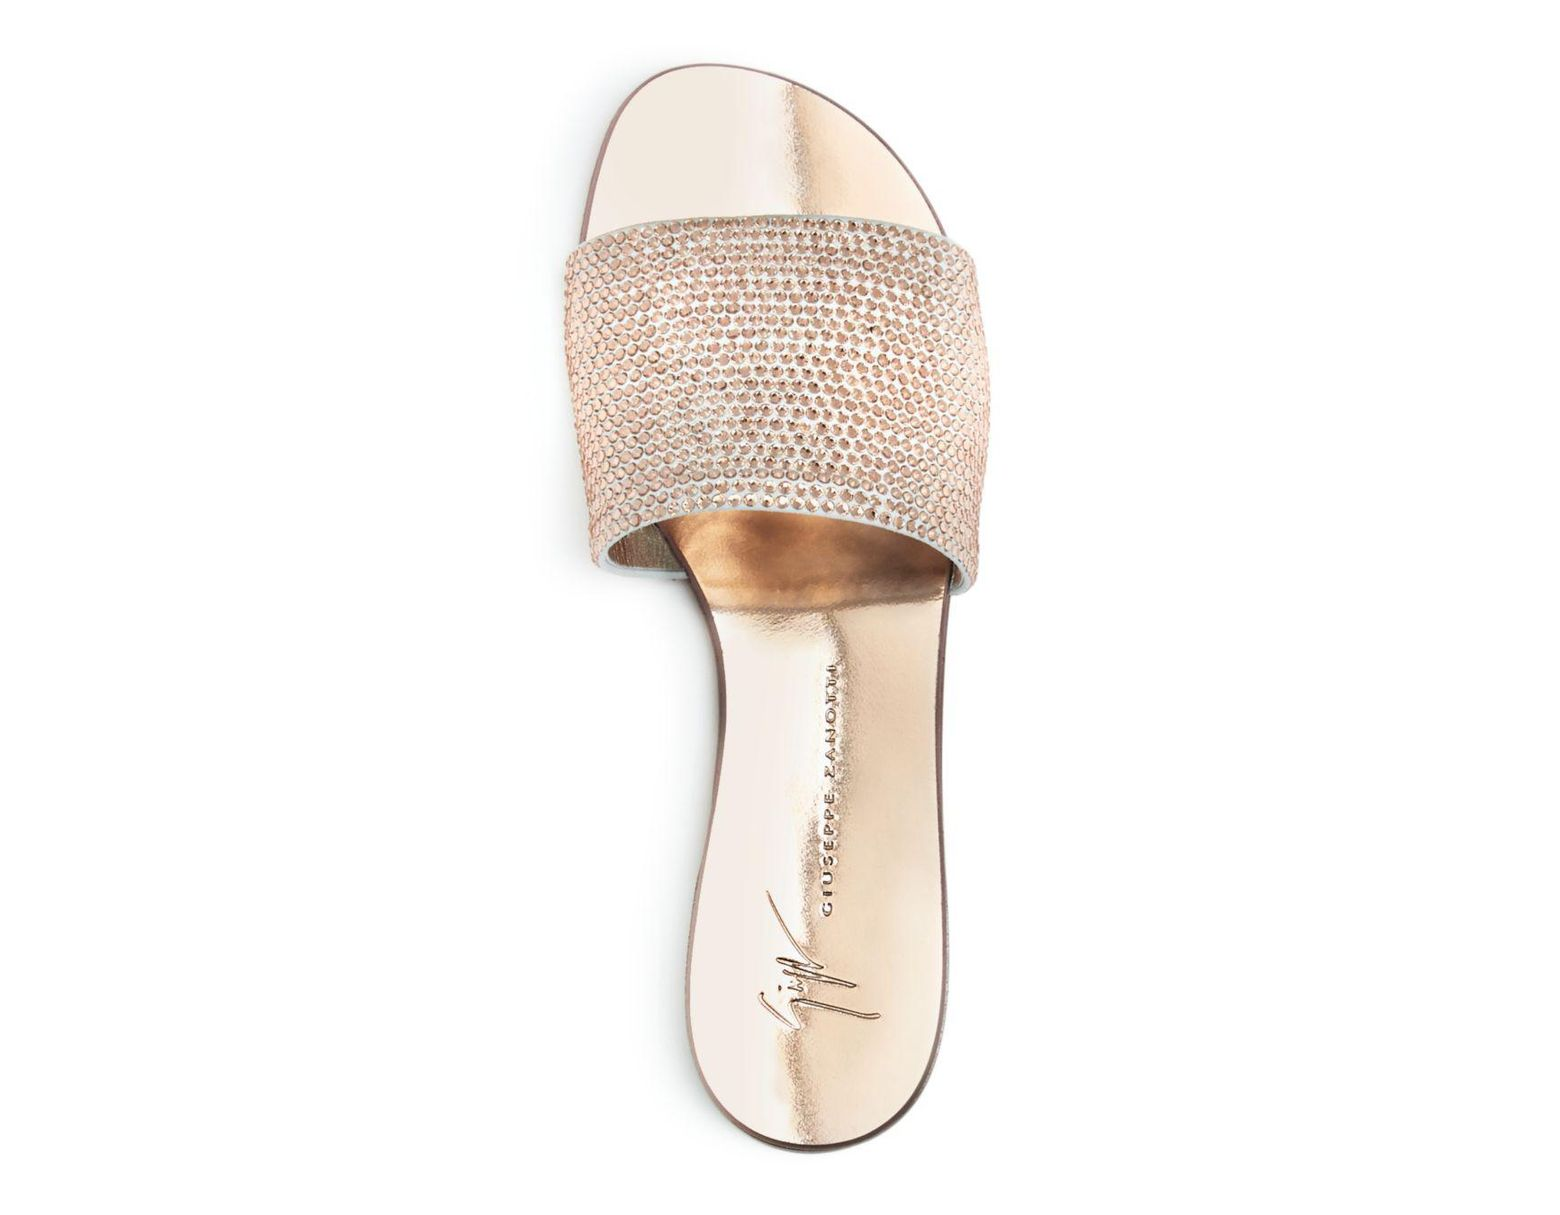 6b4d3e70cad4b Giuseppe Zanotti Women's Swarovski Crystal Embellished Slide Sandals in Pink  - Lyst